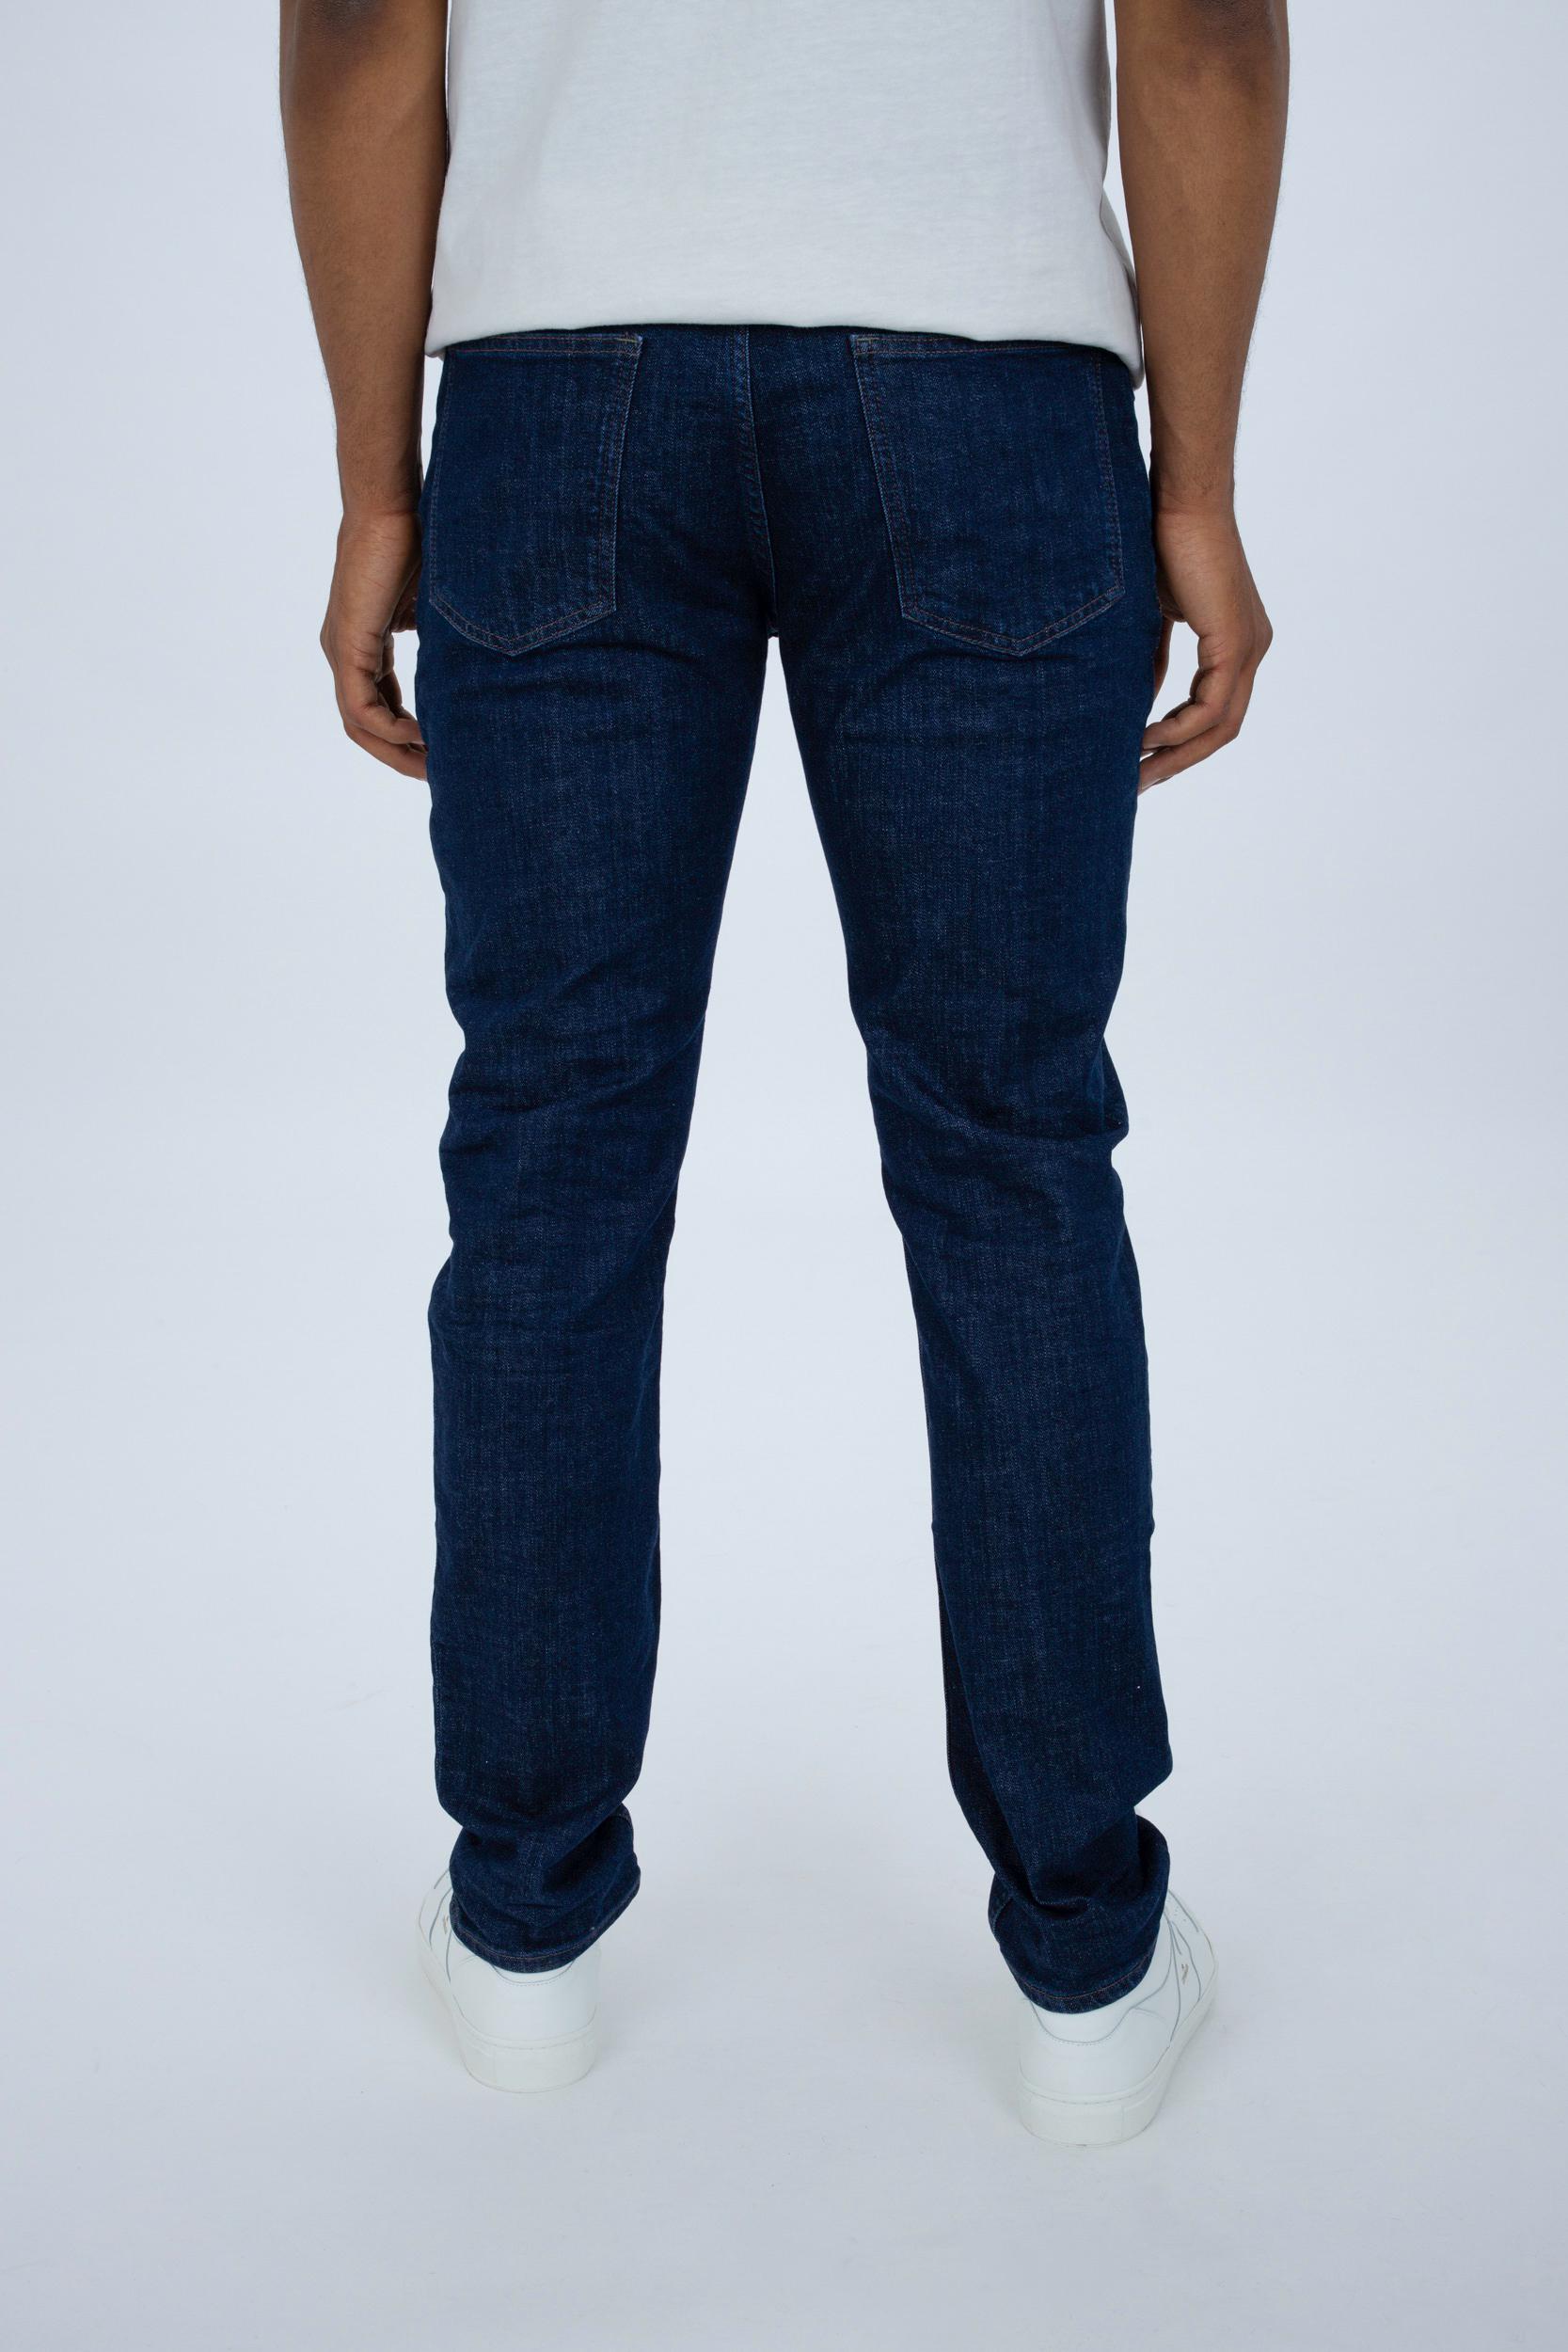 Jeans Unity Slim